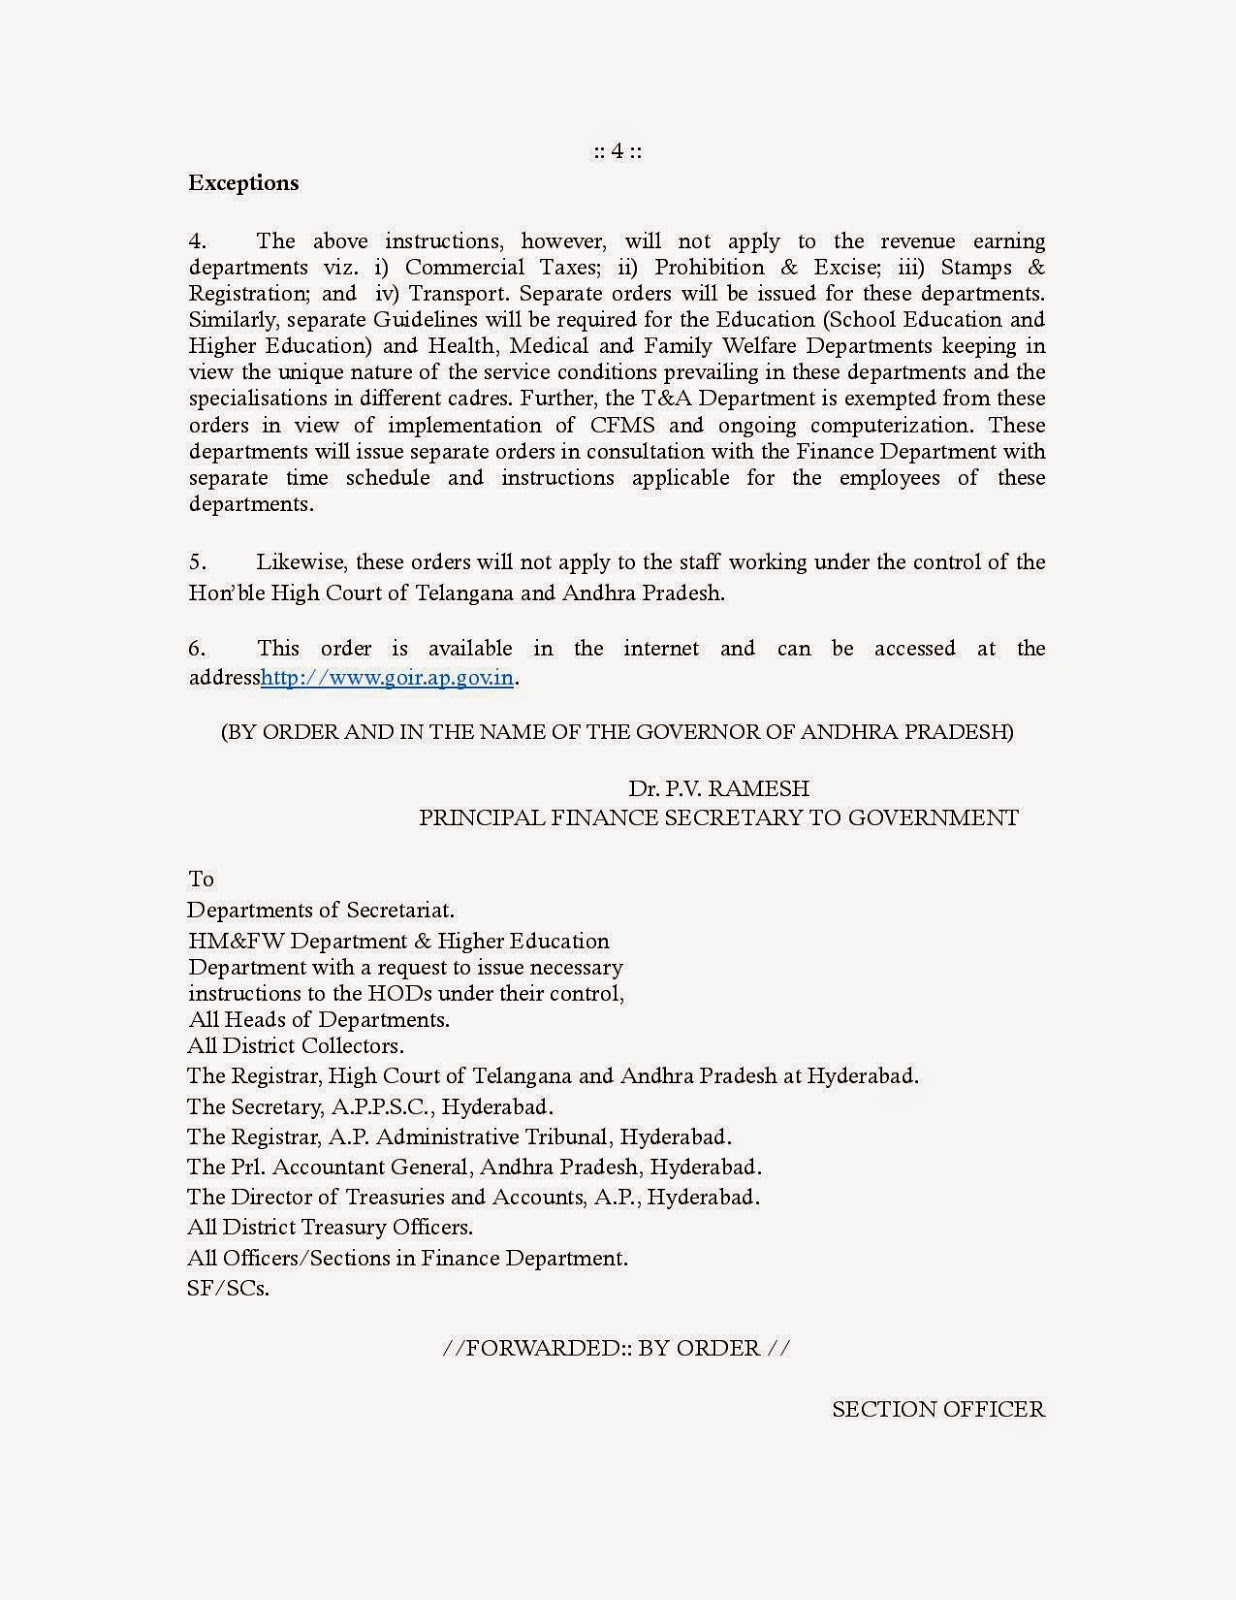 ap endowments department gos and circulars a p state general rh endowmentsdepartment blogspot com Collective Bargaining Union Seniority